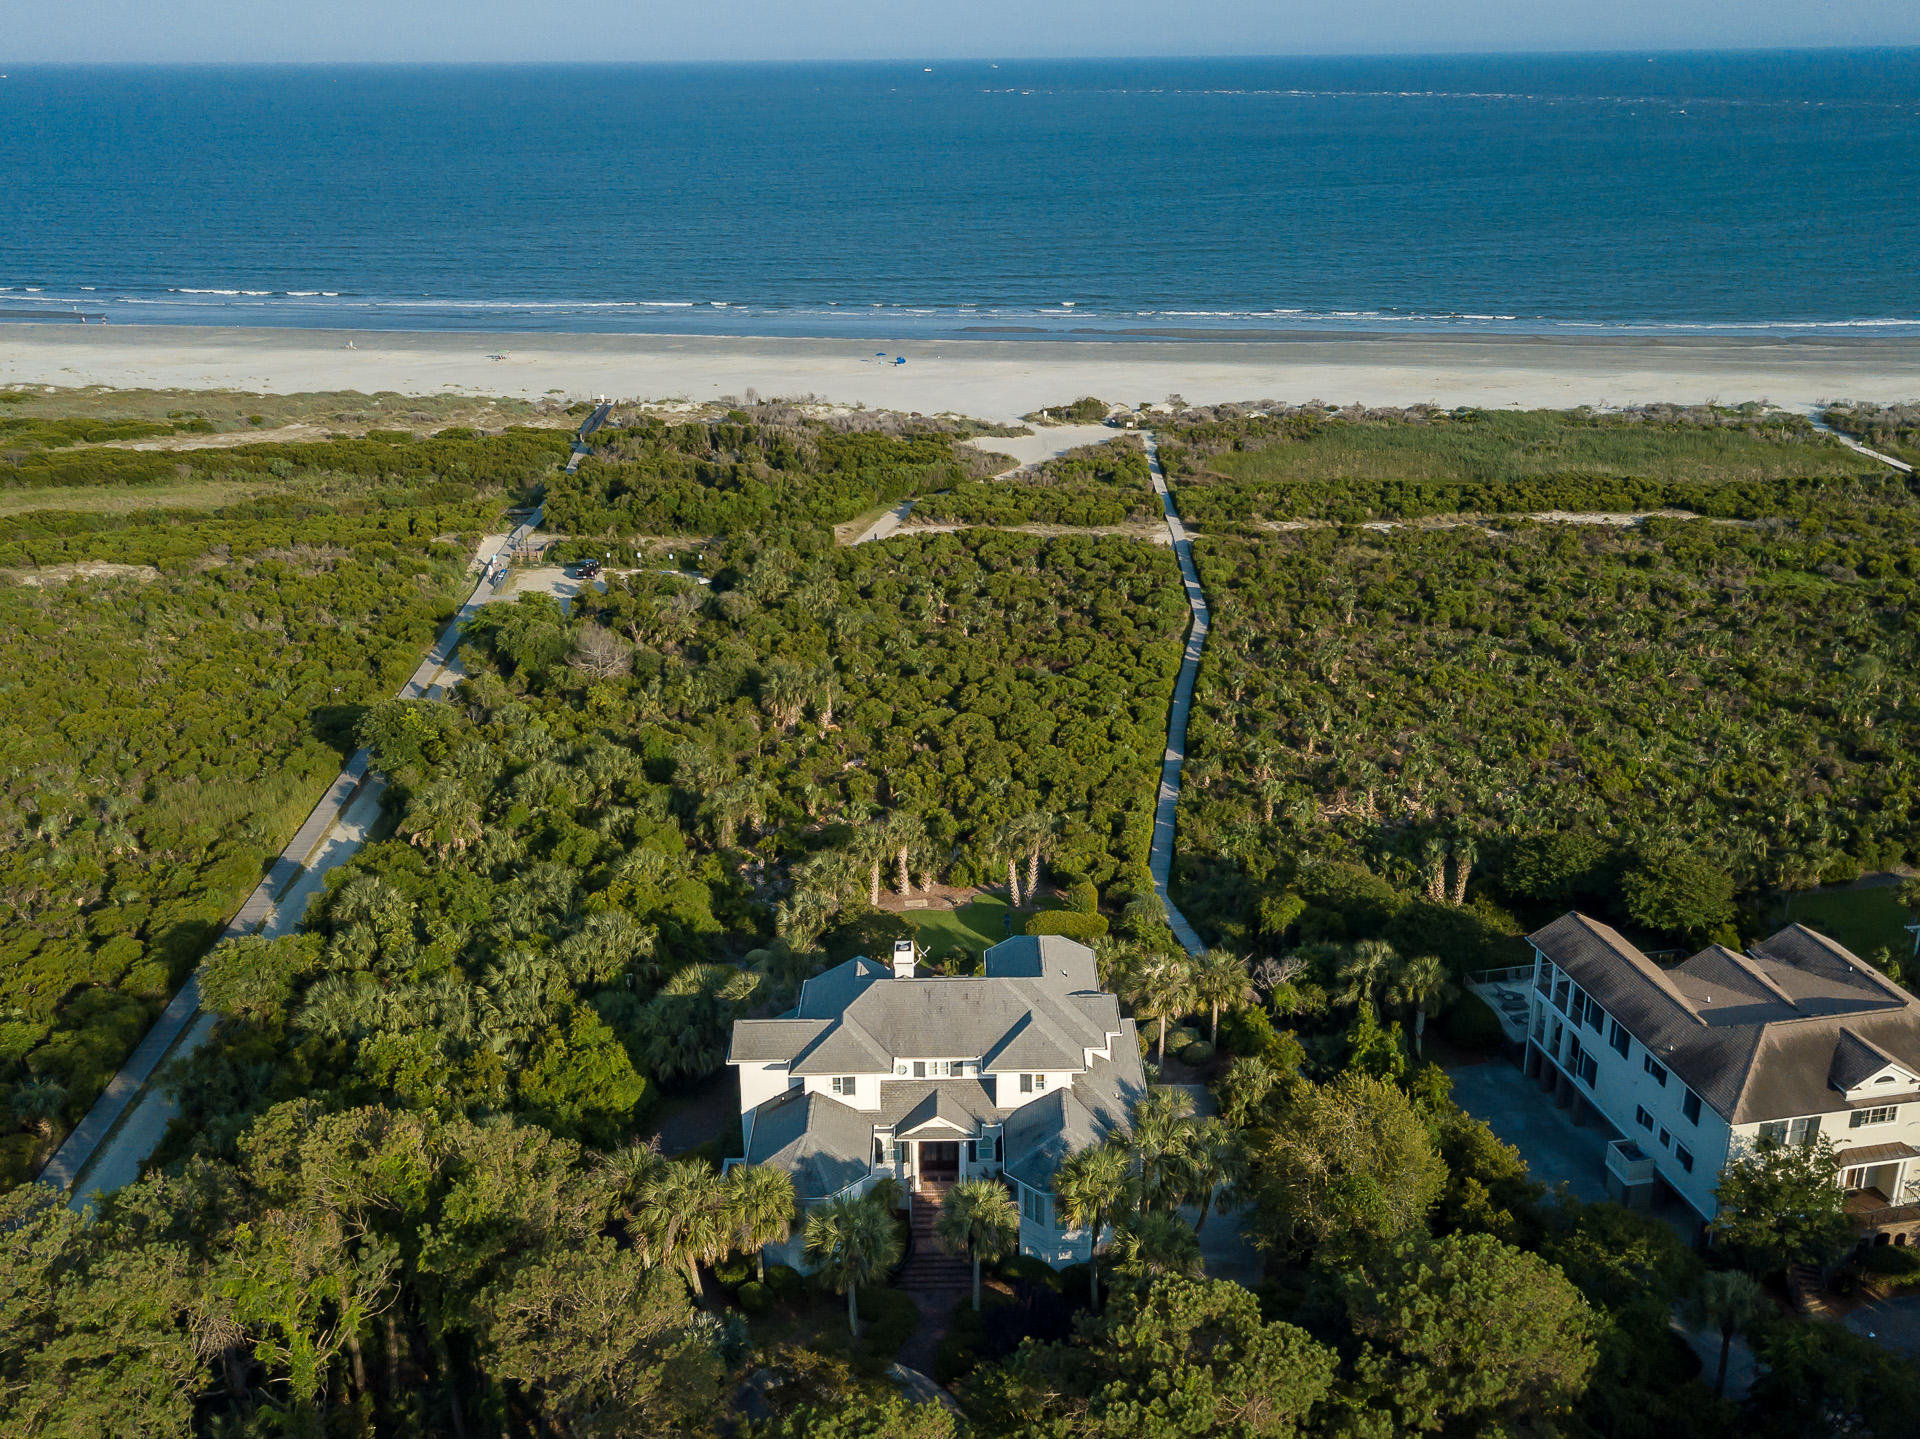 Seabrook Island Homes For Sale - 2216 Rolling Dune, Seabrook Island, SC - 20